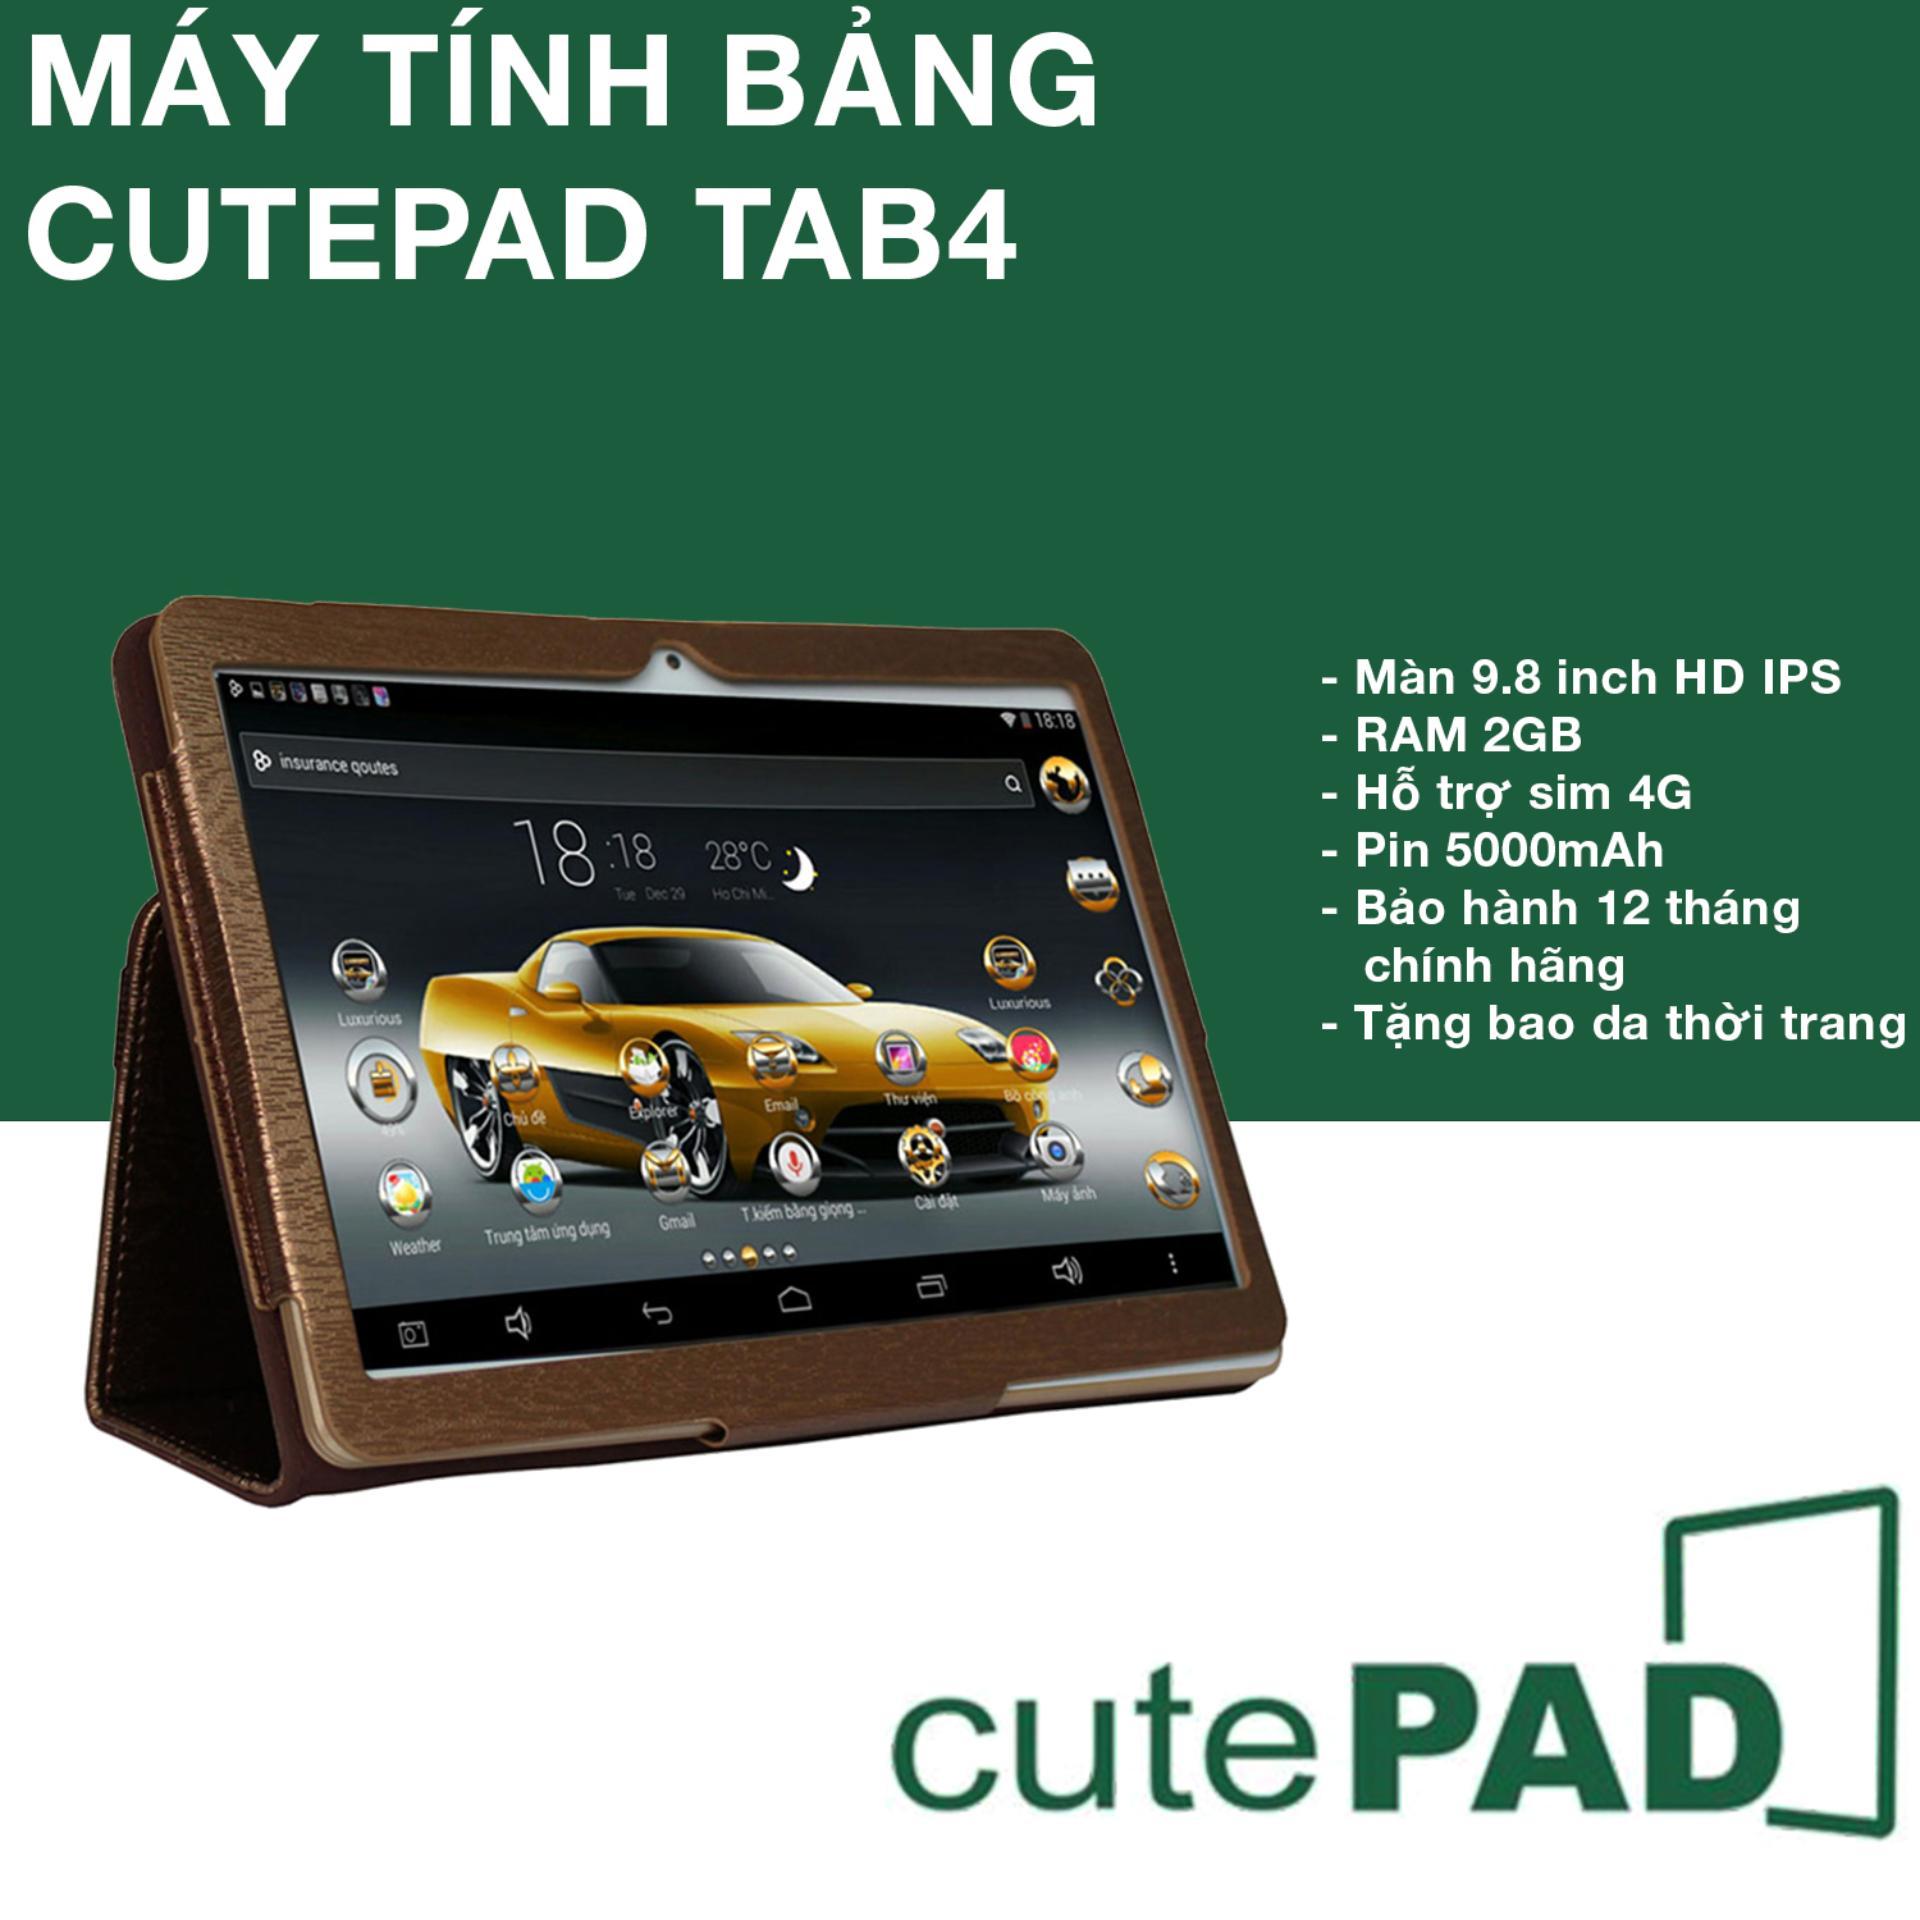 Máy tính bảng cutePAD 2018 M9601 Wifi/3G 2GB RAM 9.6